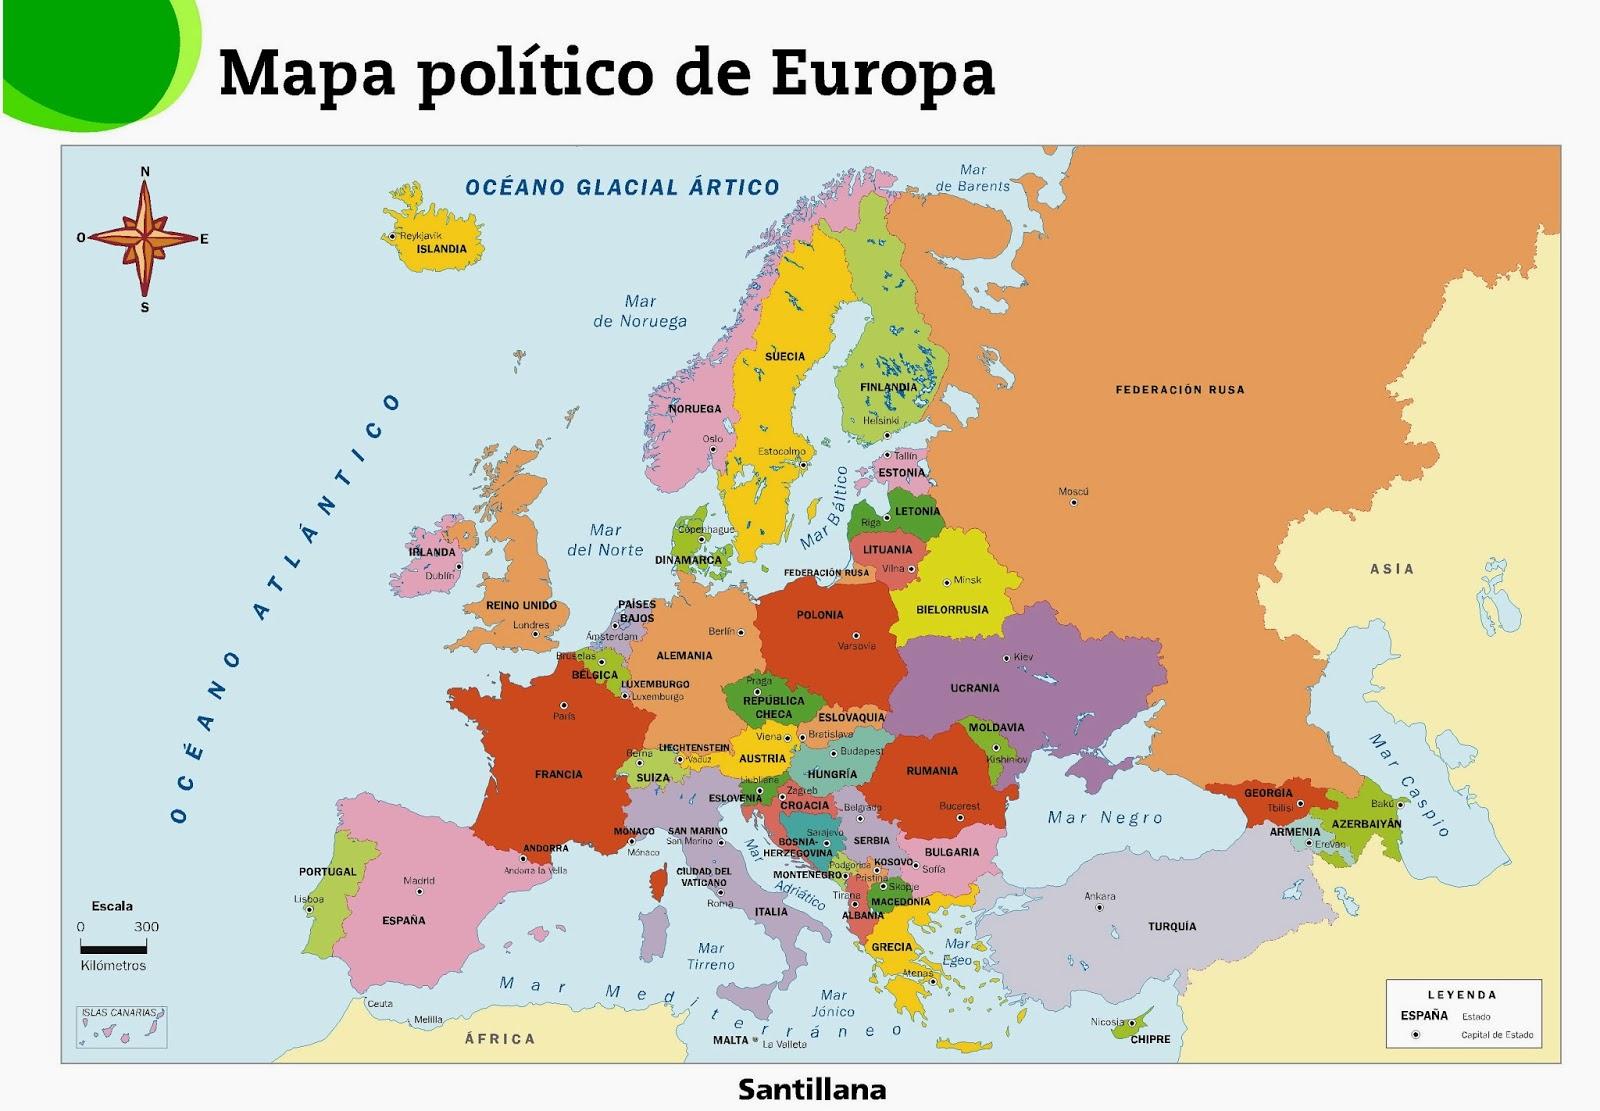 http://luisamariaarias.files.wordpress.com/2013/01/mapa-polc3adtico-de-europa2.jpg